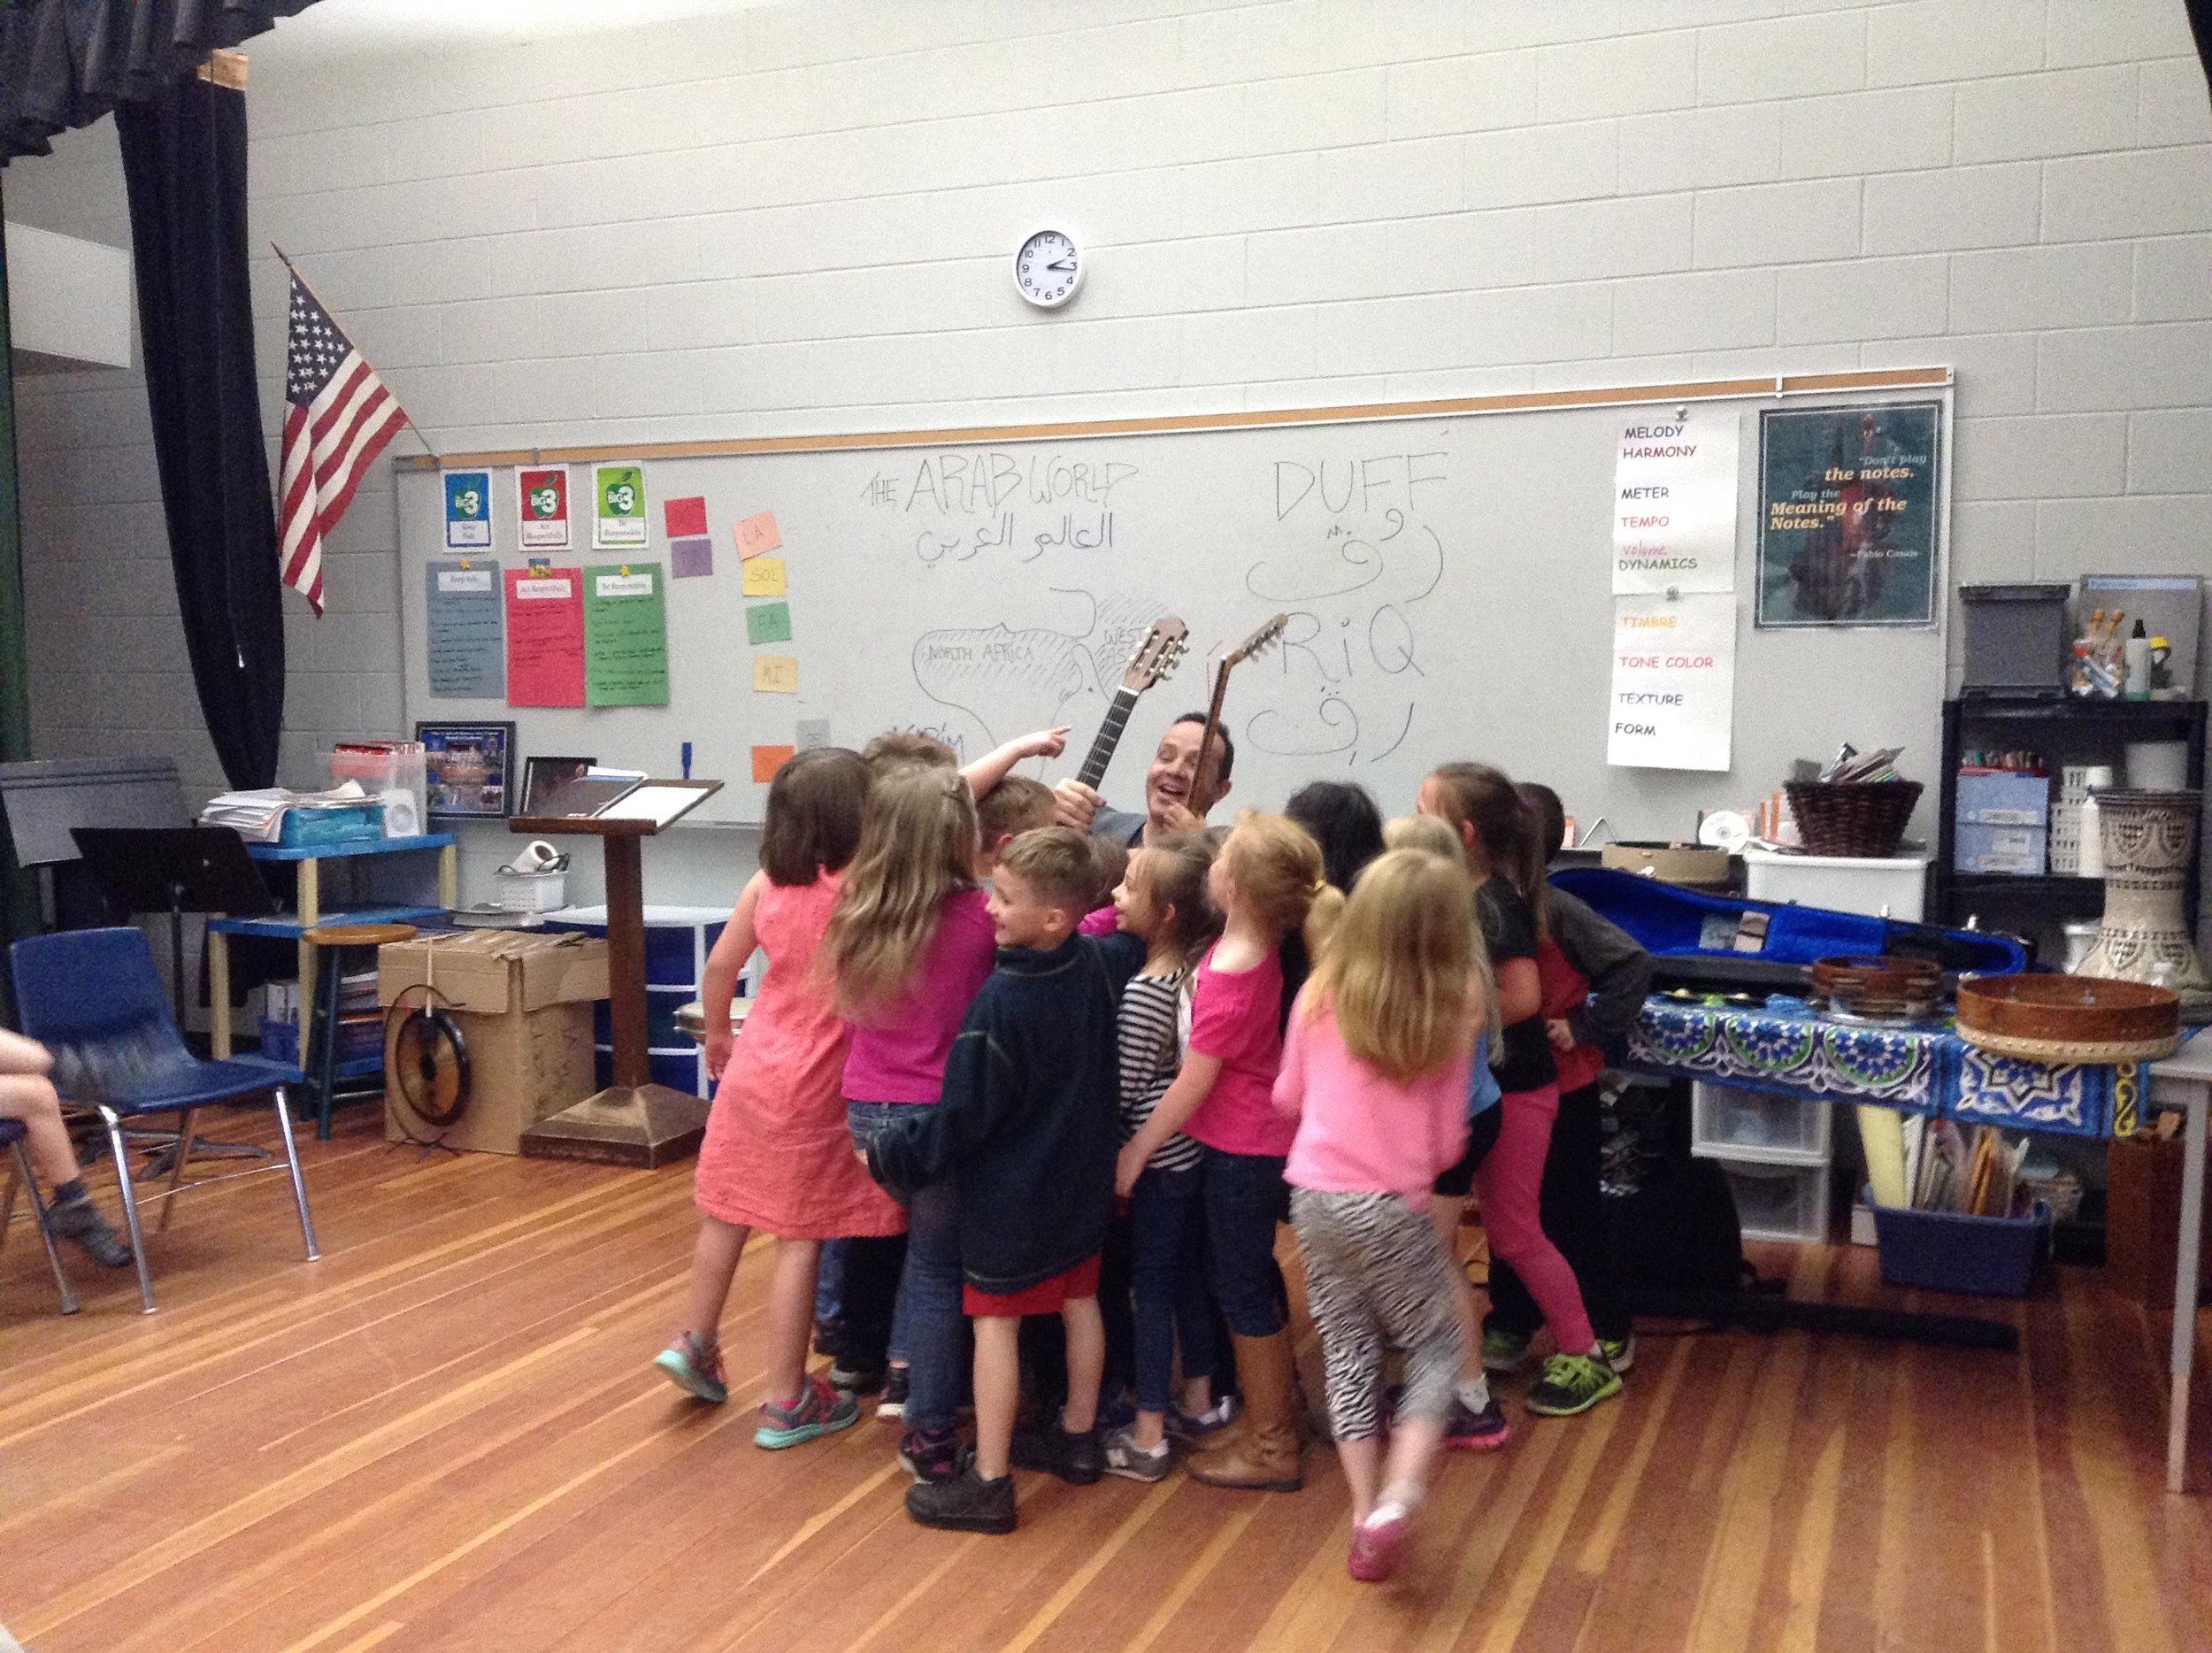 Egyptian musician & Dancer Karim Nagi shares his music with kindergarteners at ka brett school